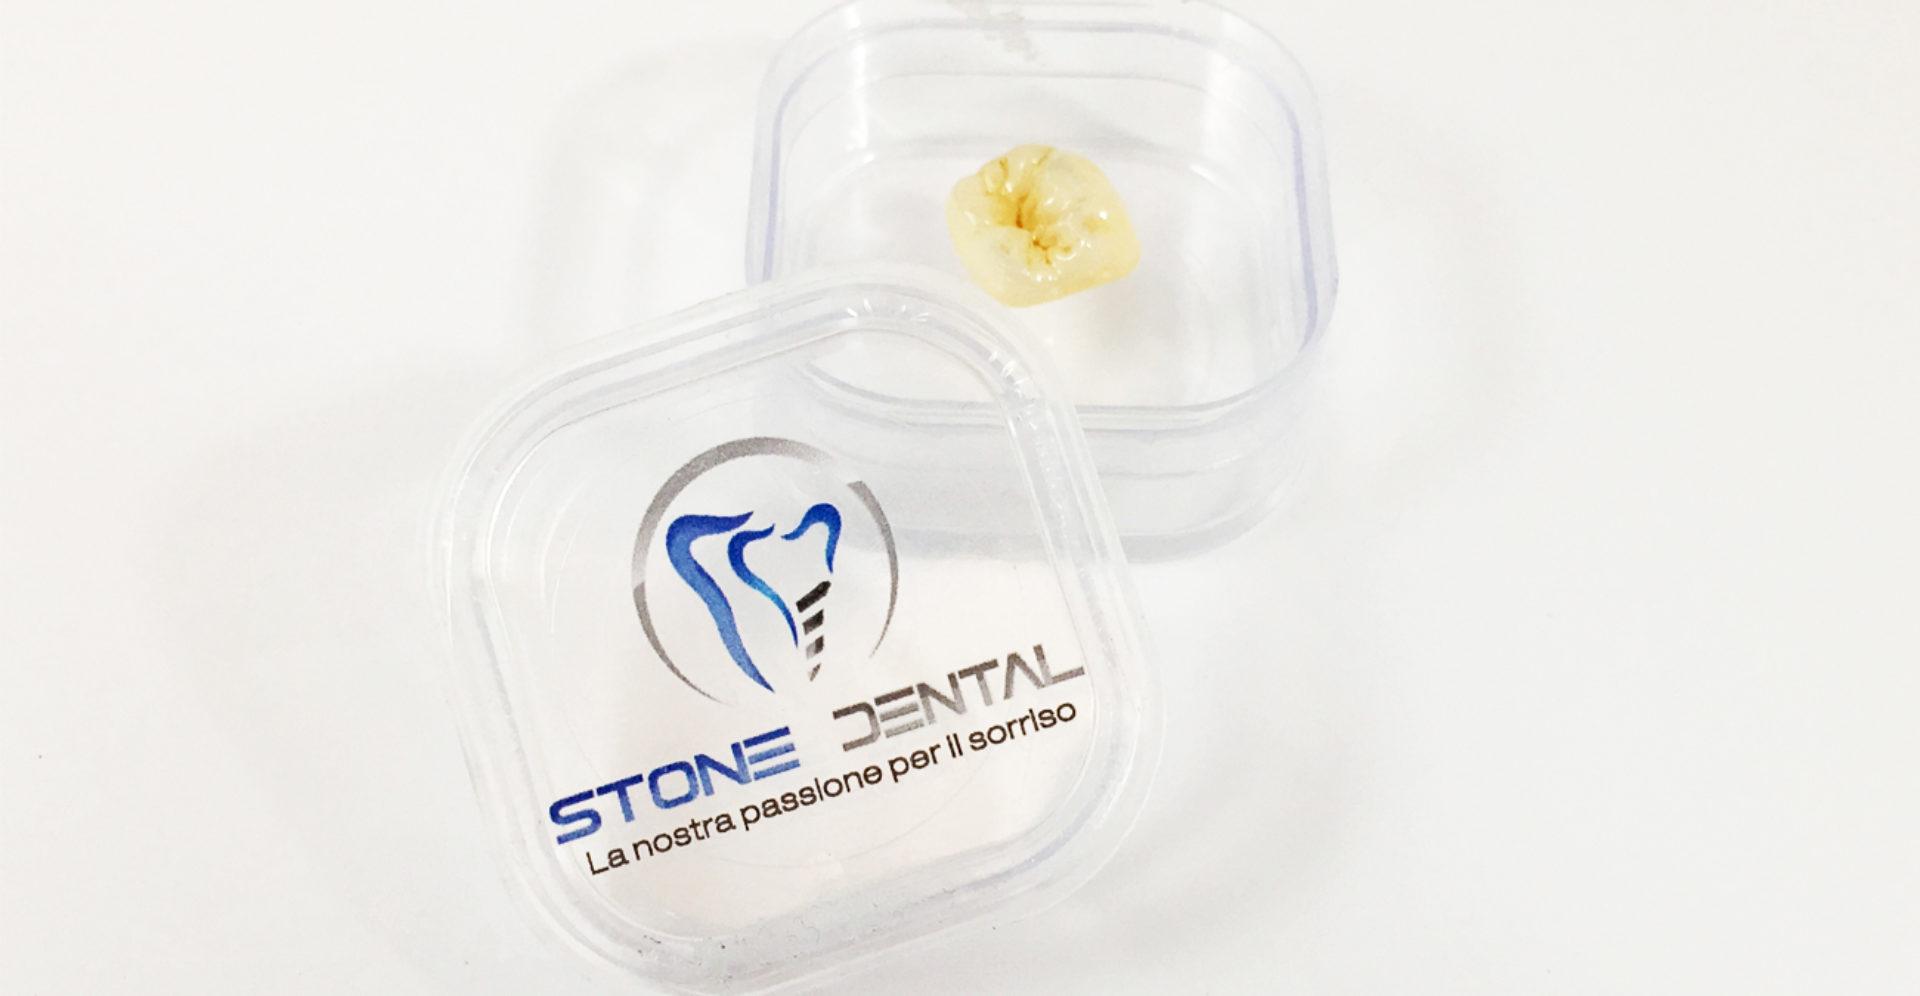 Stone Dental